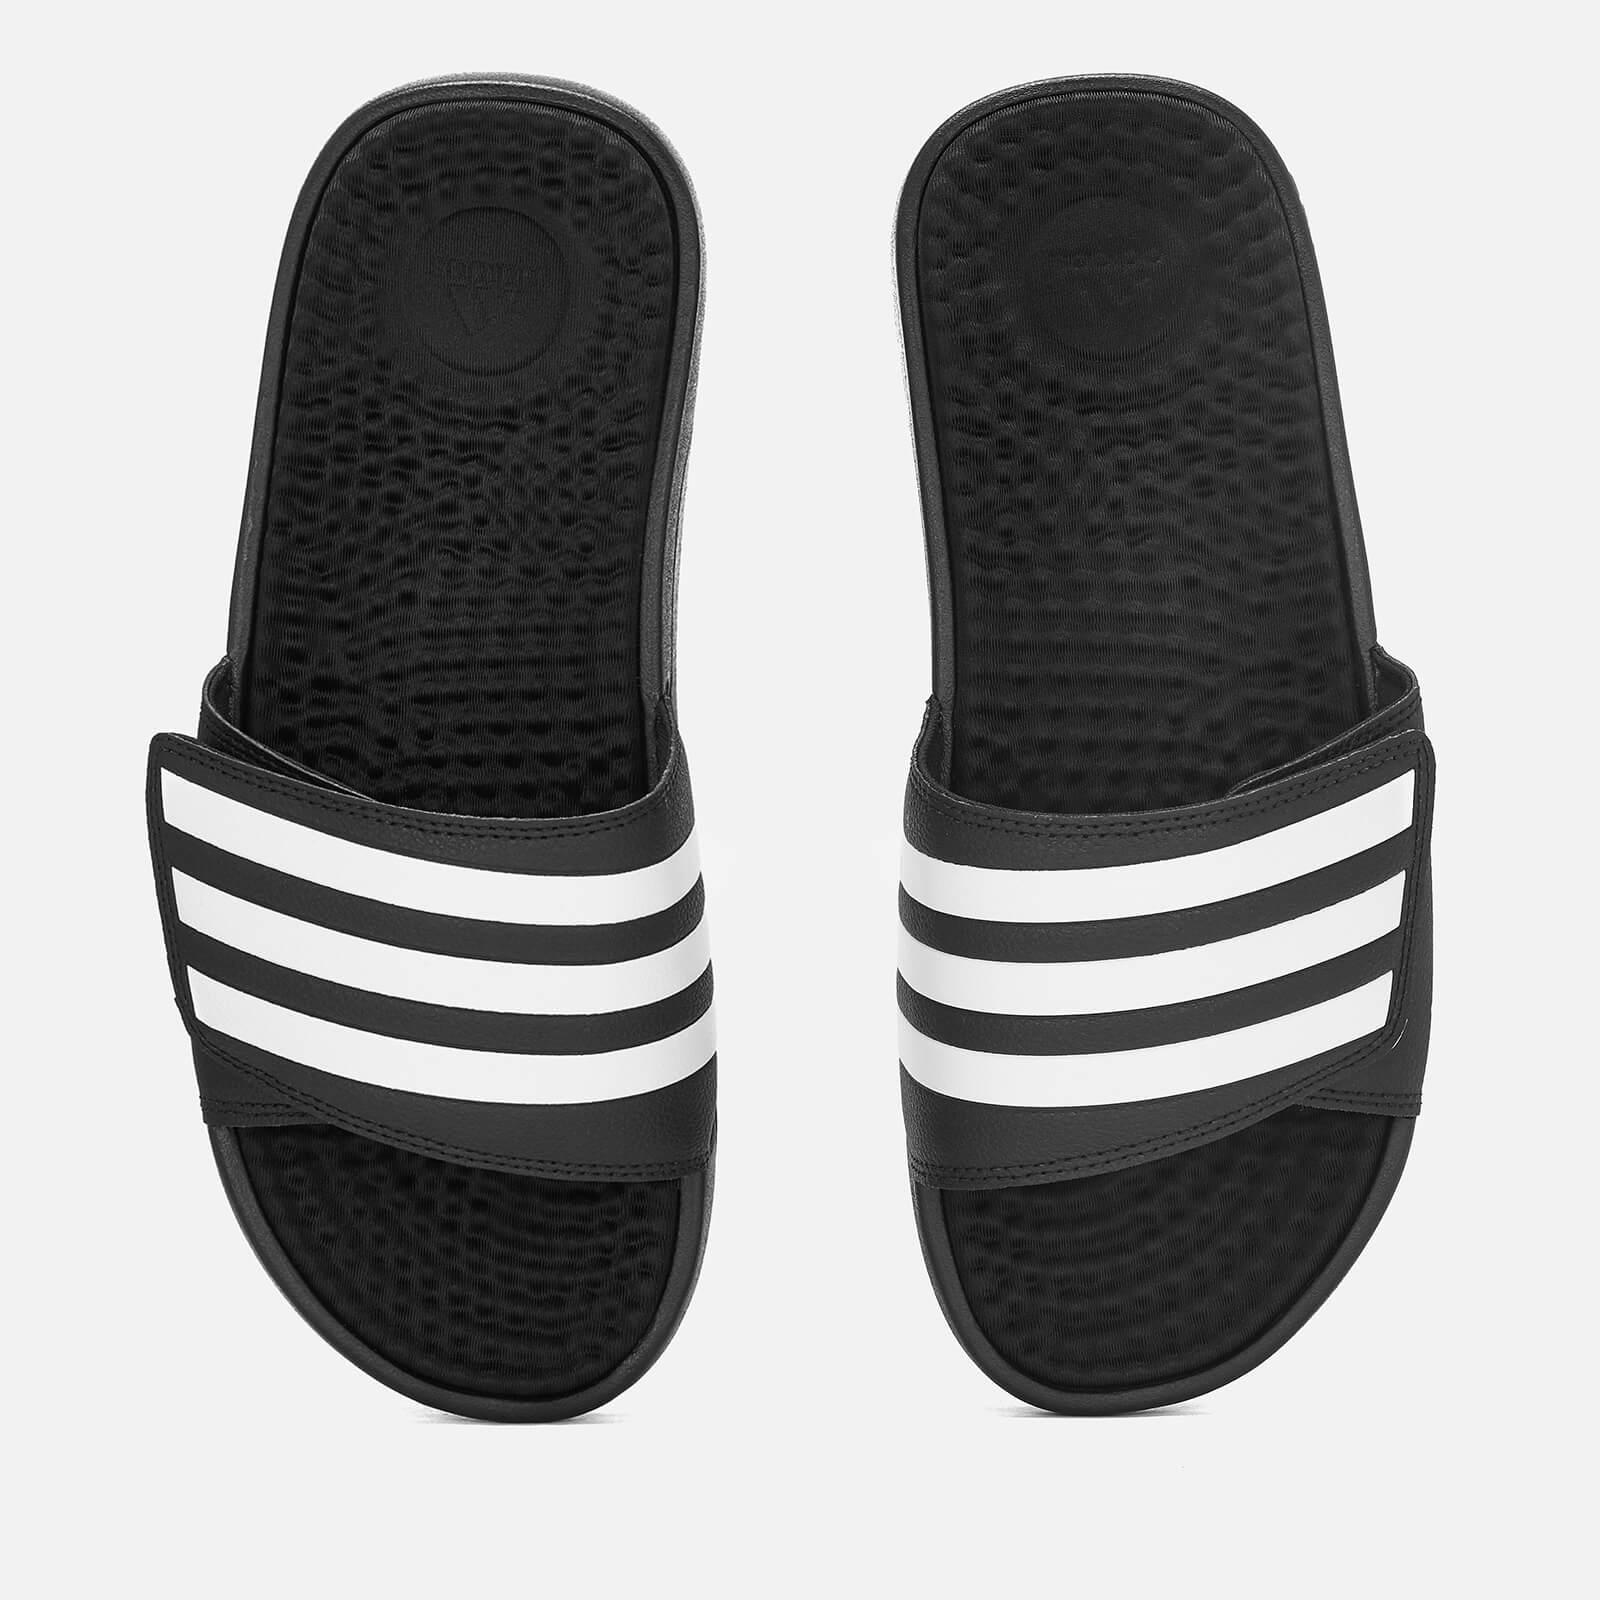 adidas Men's Adissage TND Slide Sandals - Black - UK 7 - Black